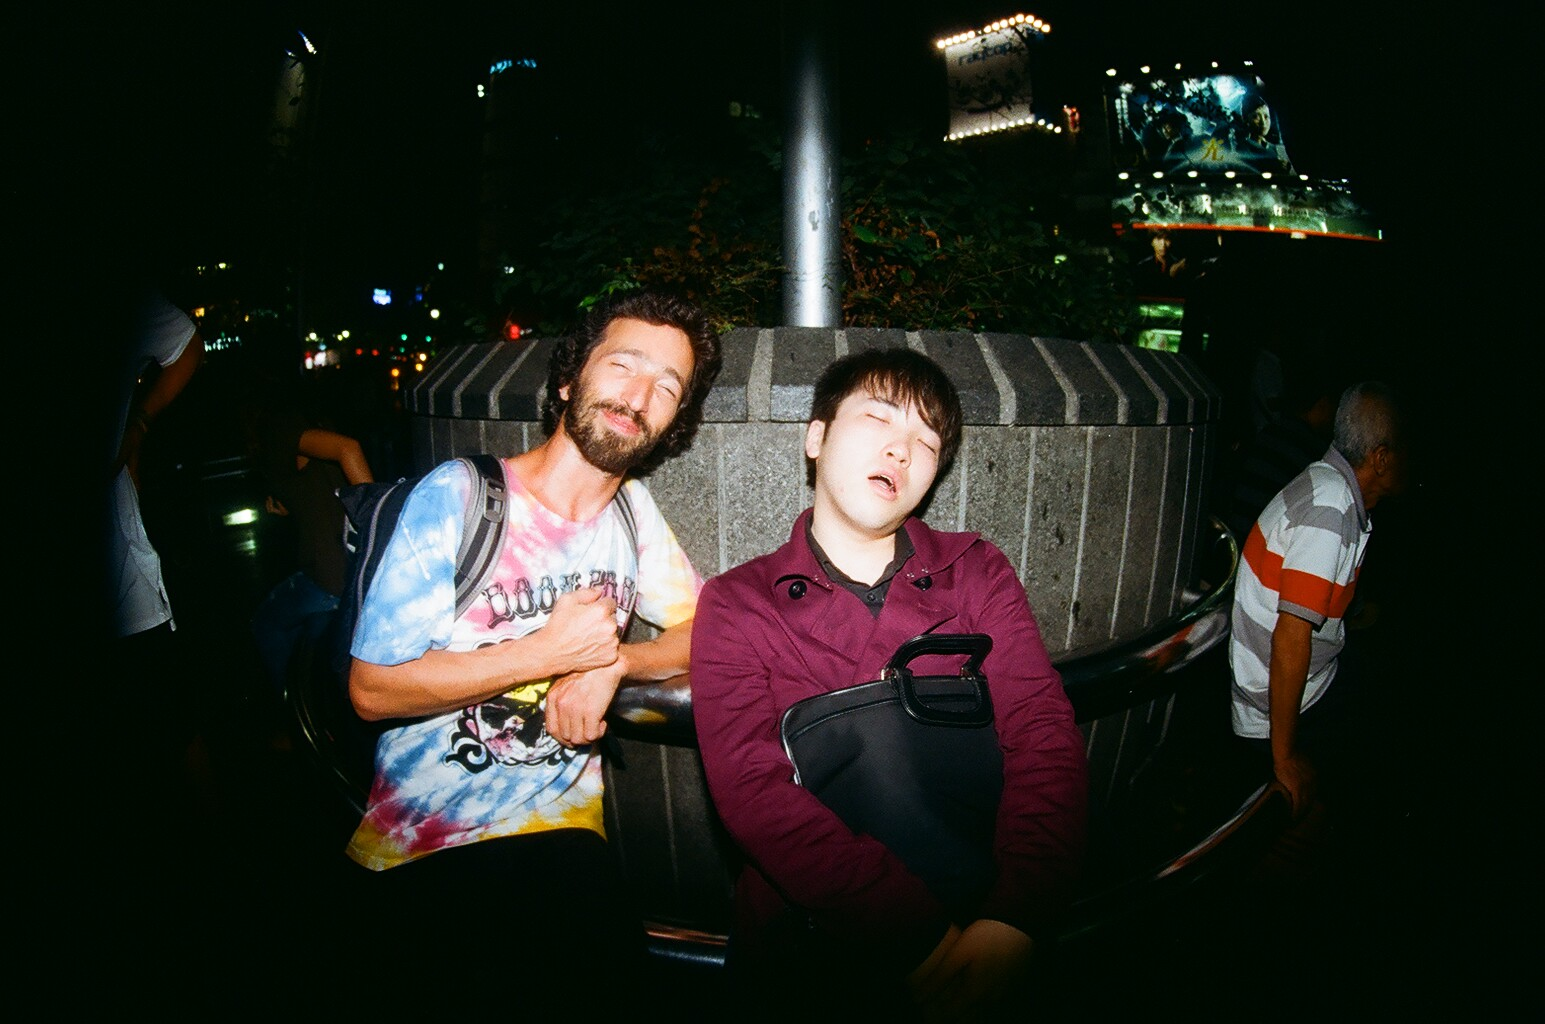 Boom Pam & Mayumi / Japan 2015